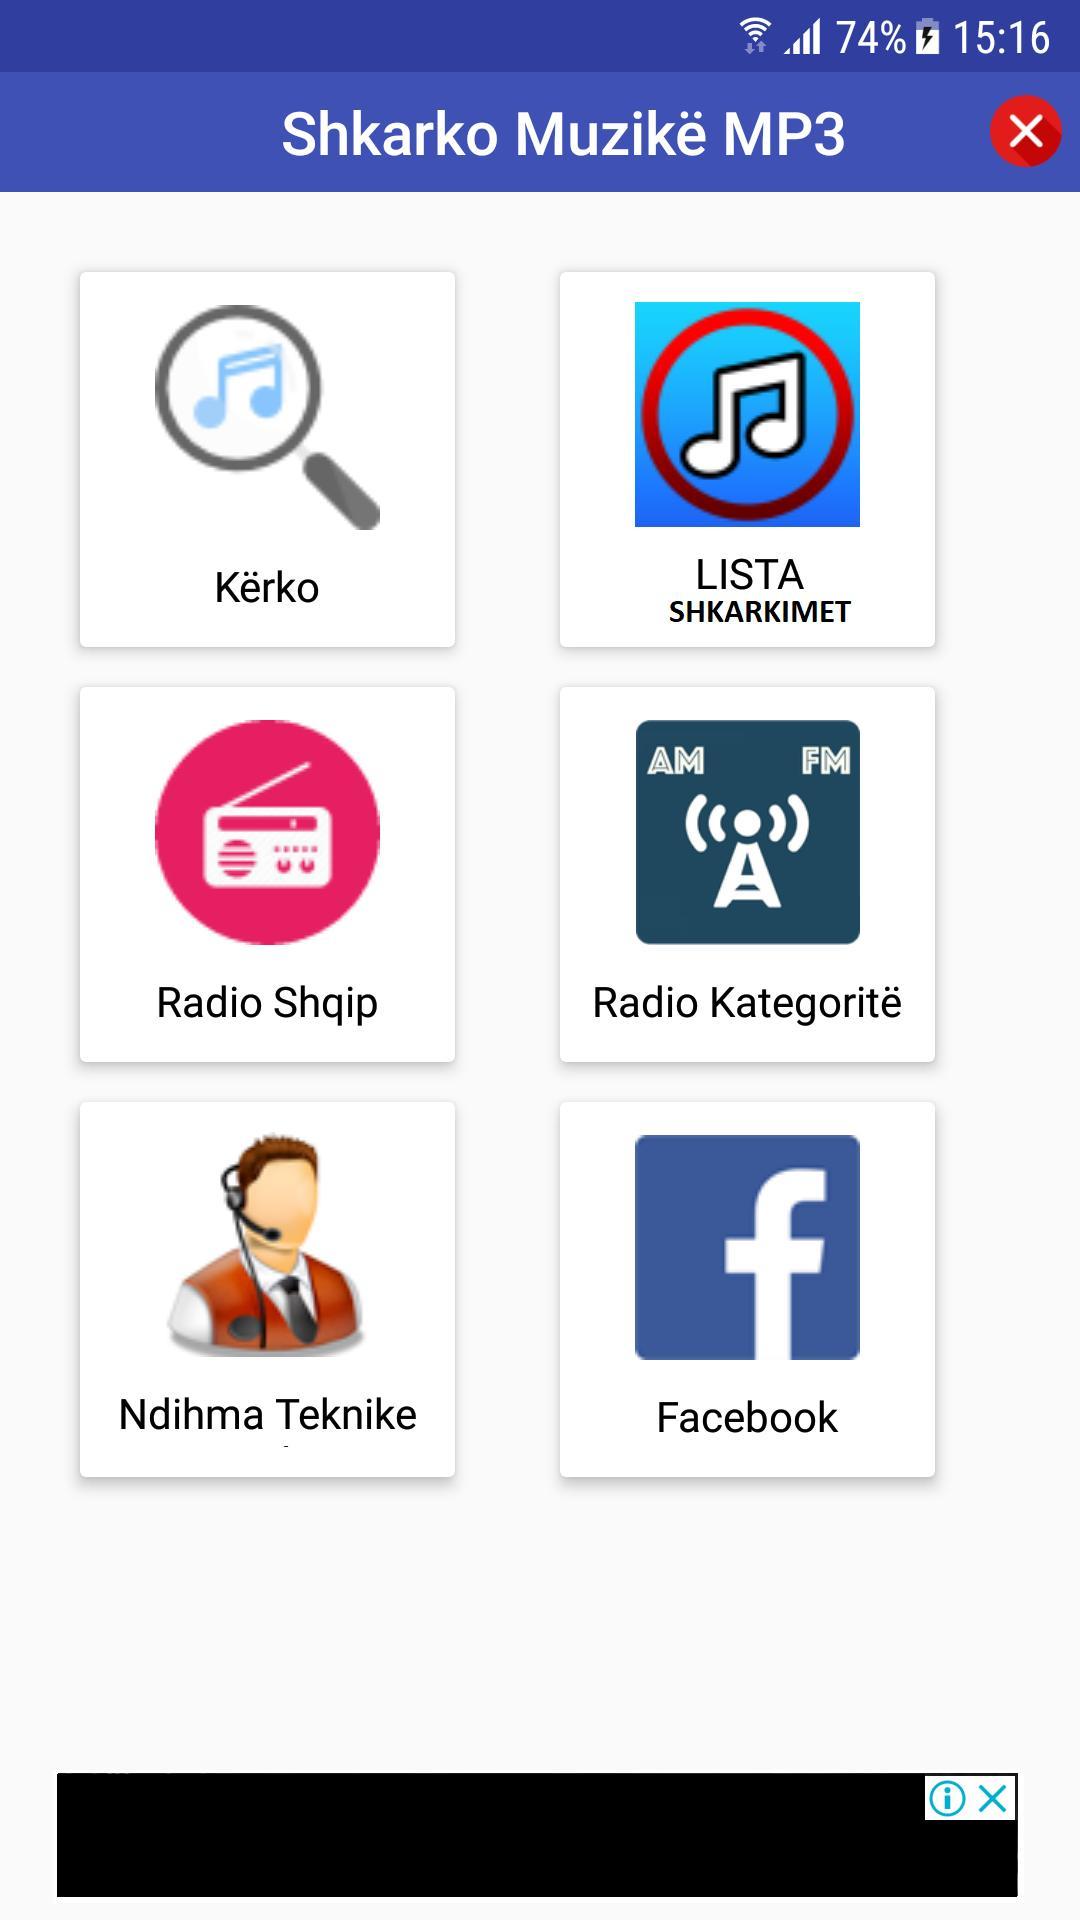 Shkarko Muzikë MP3 + Live Radio for Android - APK Download